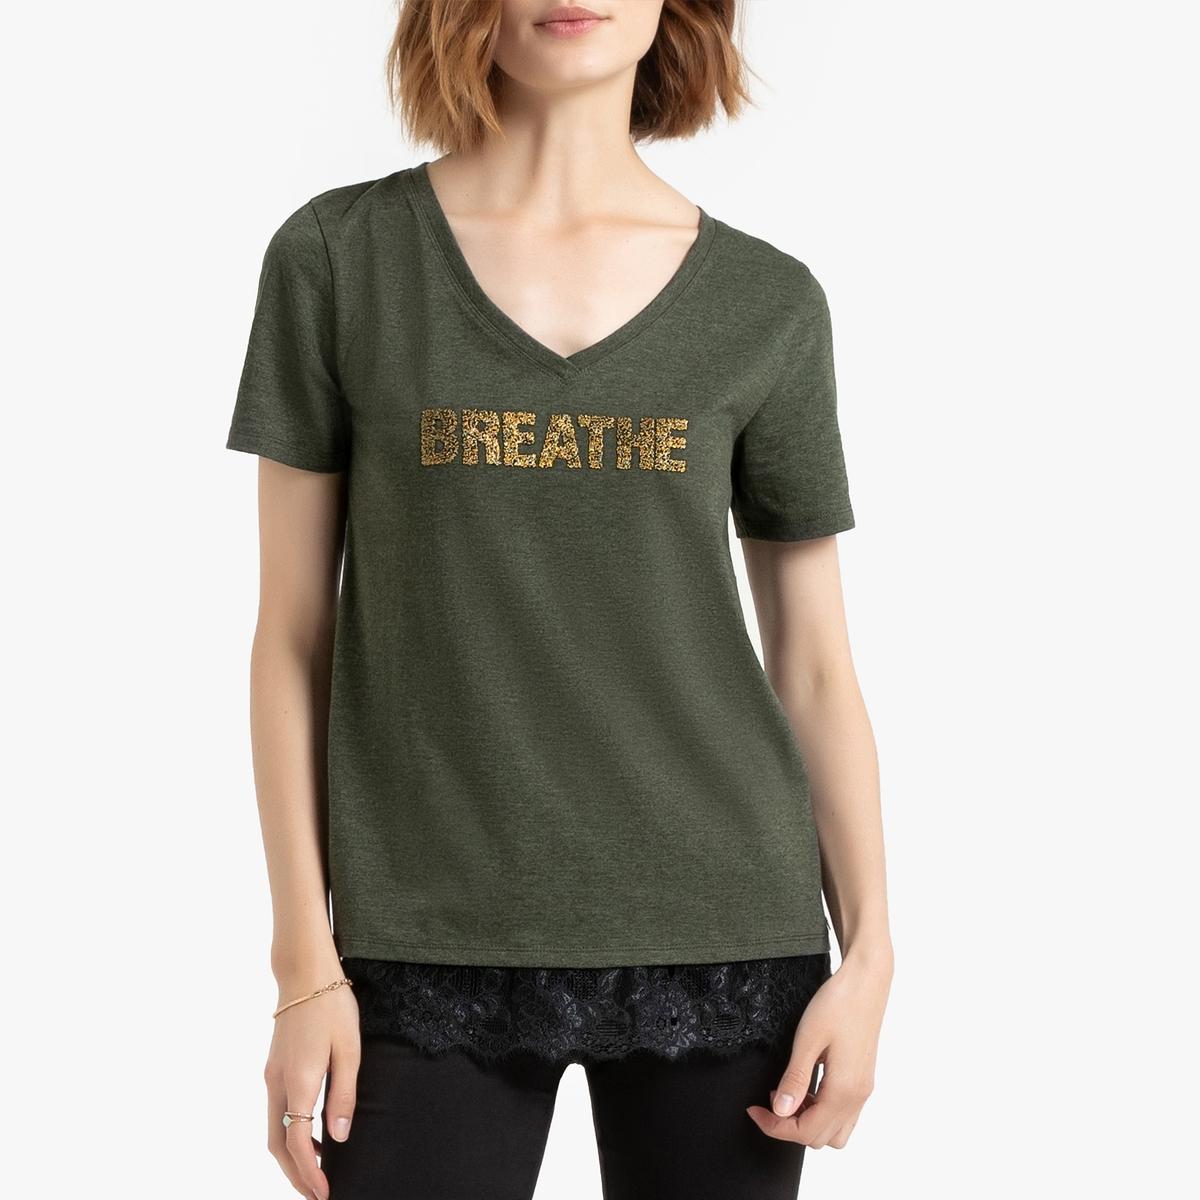 Футболка La Redoute С короткими рукавами V-образным вырезом и логотипом на груди XS зеленый футболка la redoute с v образным вырезом короткими рукавами и принтом спереди l белый